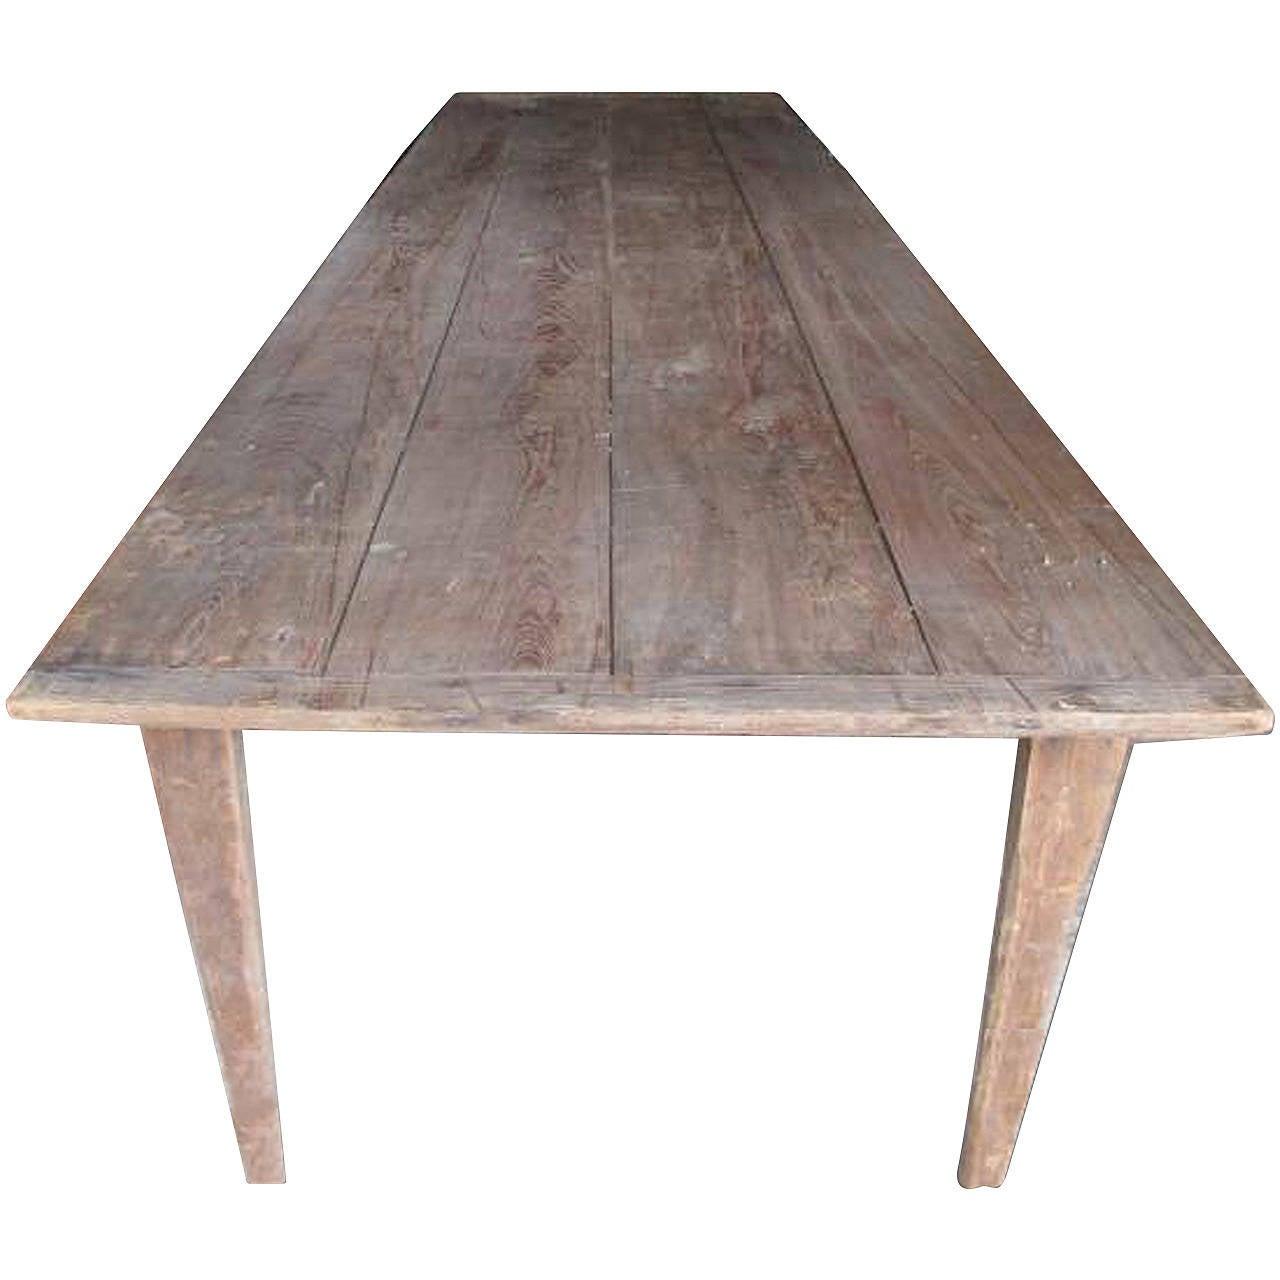 Tall Dining Room Tables